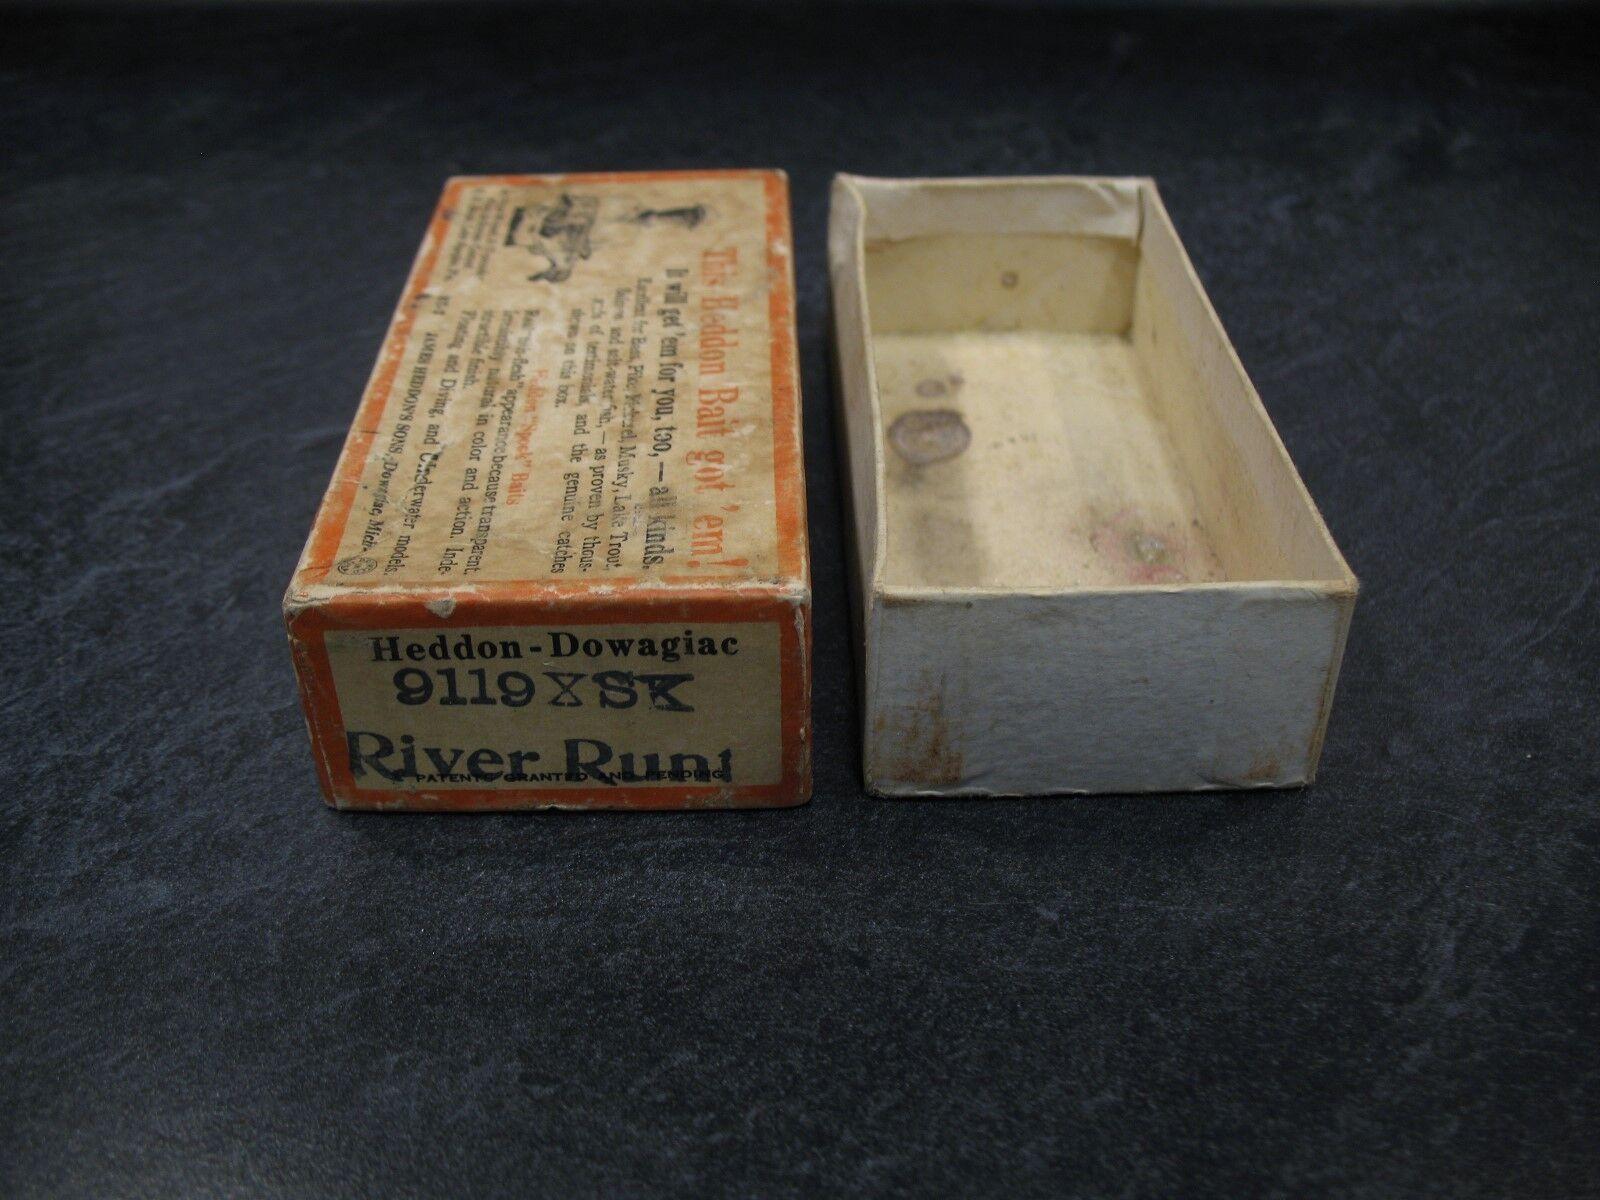 HEDDON 9119XSK BRUSH BOX (only) RIVER RUNT SINKER goldFISH SHORE Fishing Lure